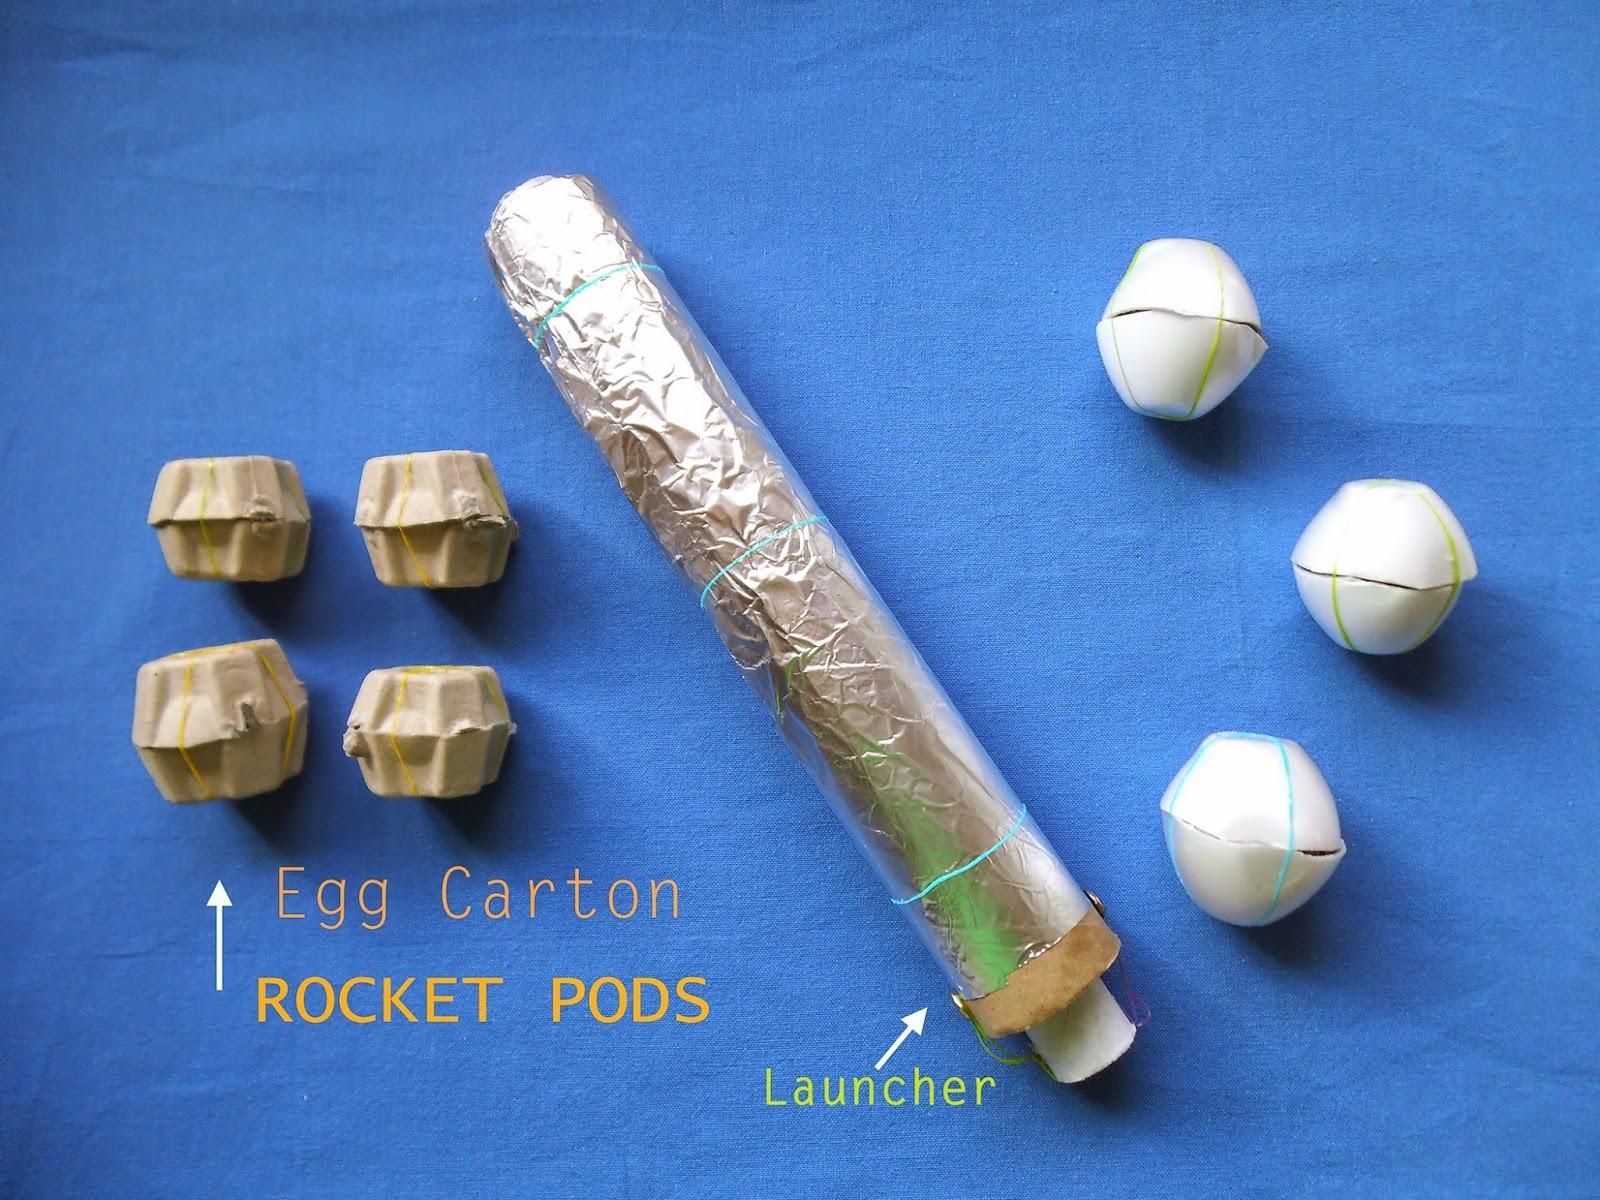 http://2.bp.blogspot.com/-e6i-sDx9VqA/U-LAZIoqw9I/AAAAAAAACnI/pTV8rd7bmII/s1600/rocket-pods.jpg